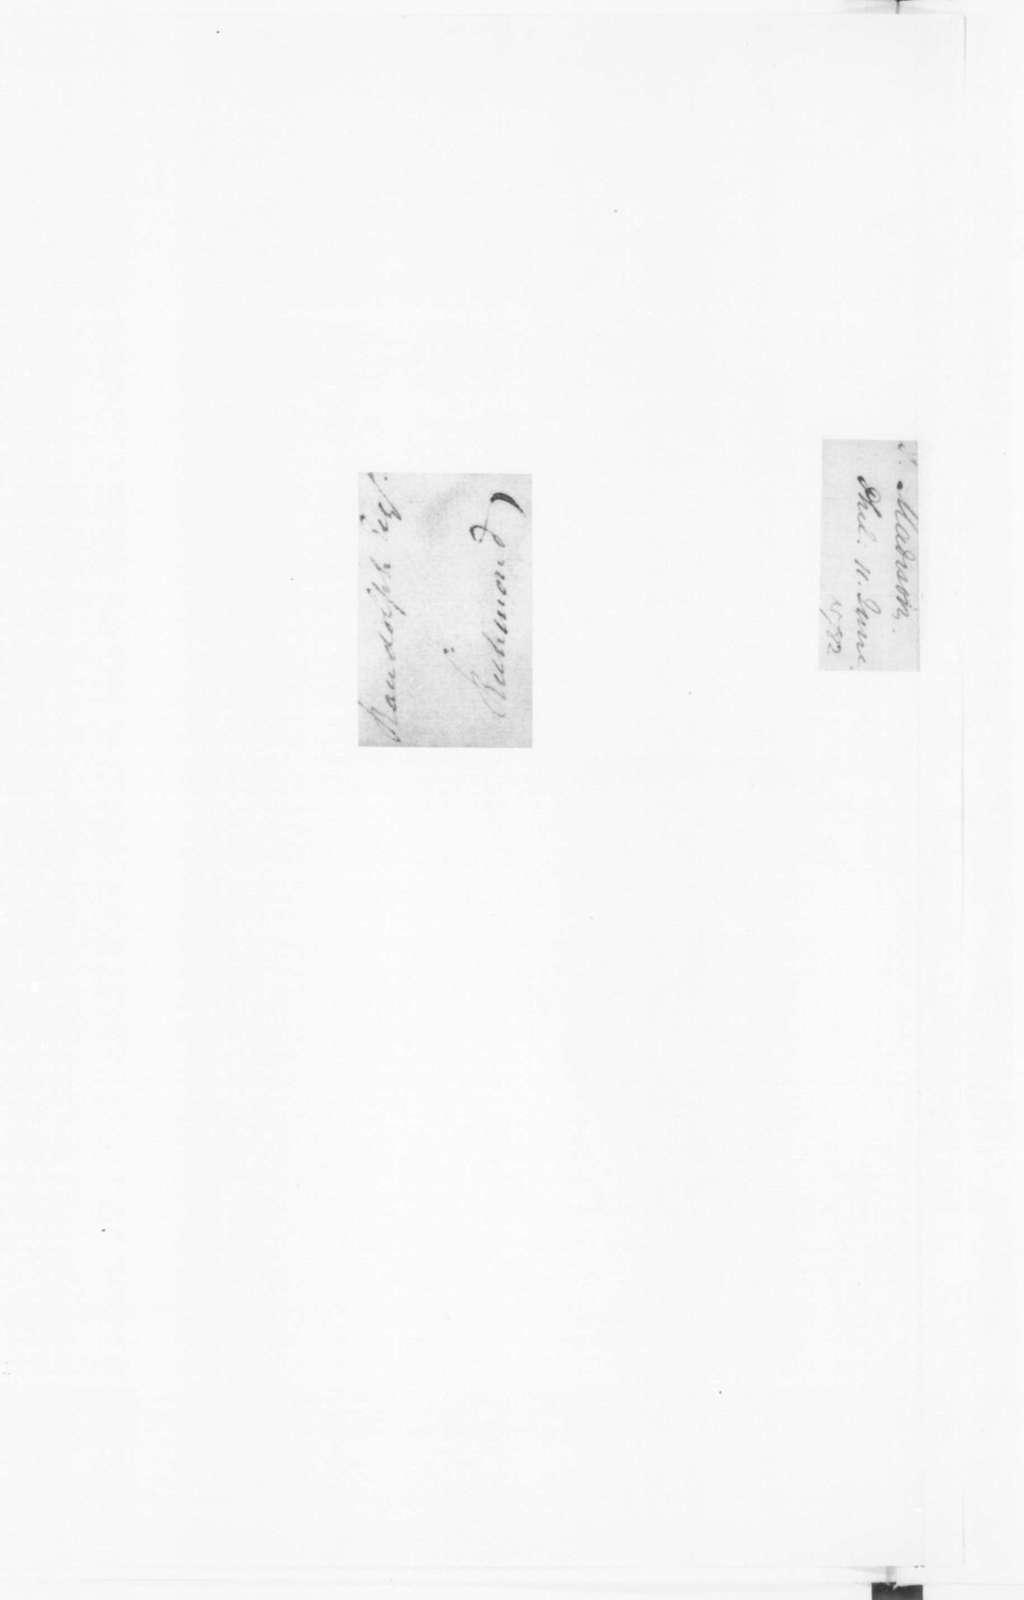 James Madison to Edmund Randolph, June 11, 1782.